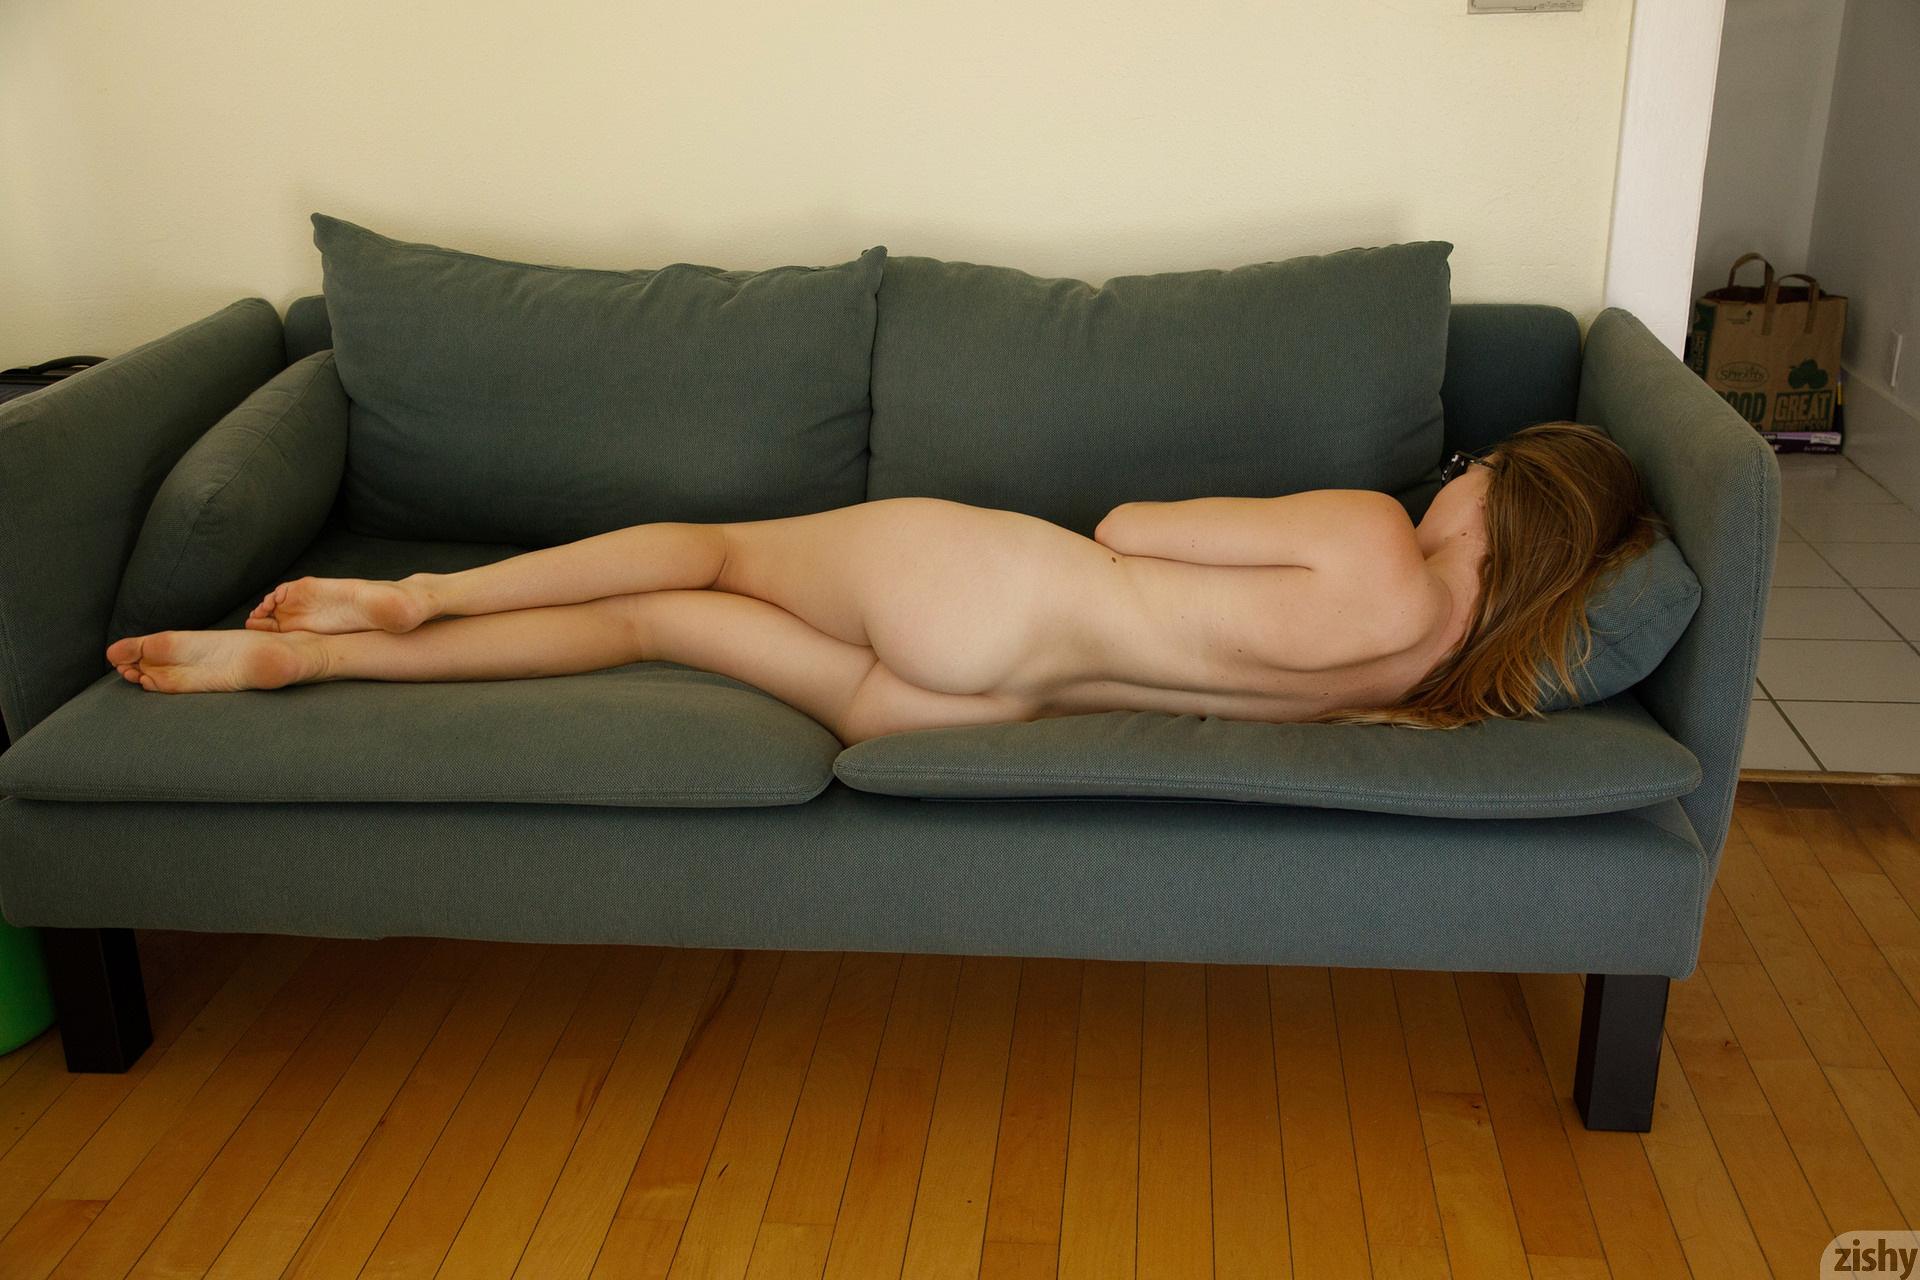 Ashley Lane Everyday People Zishy (35)